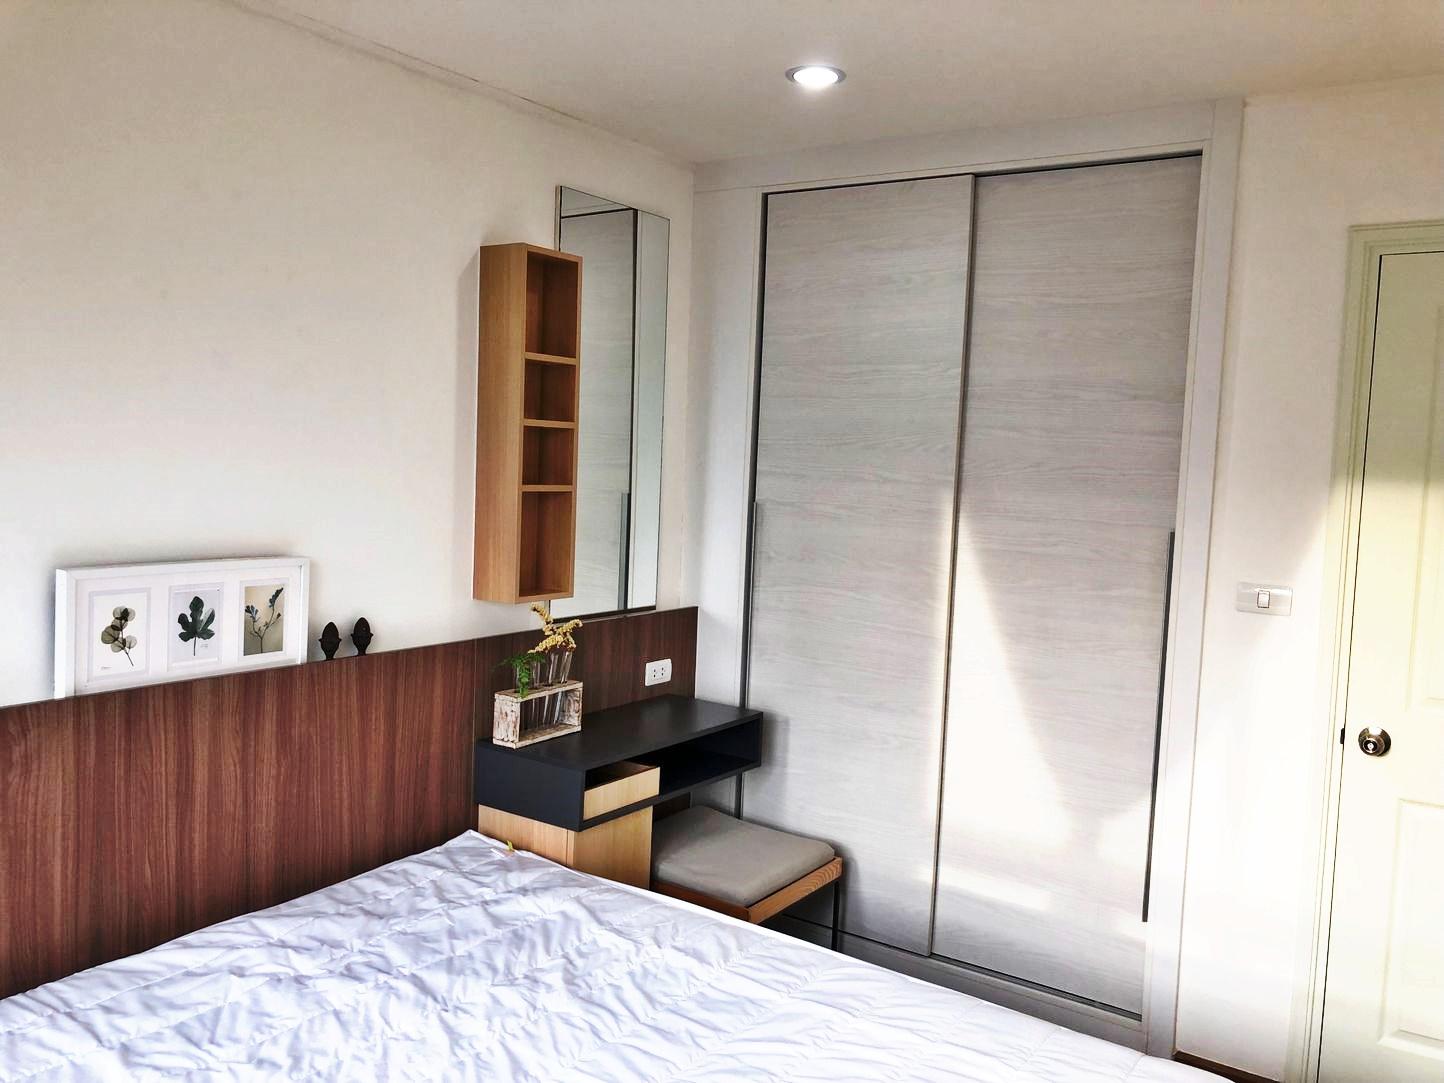 For RentCondoRattanathibet, Sanambinna : Condo for rent, U Delight Rattanathibet 30 sqm. 1 bed 1 bath, beautiful room, ready to move in 8,500 / month